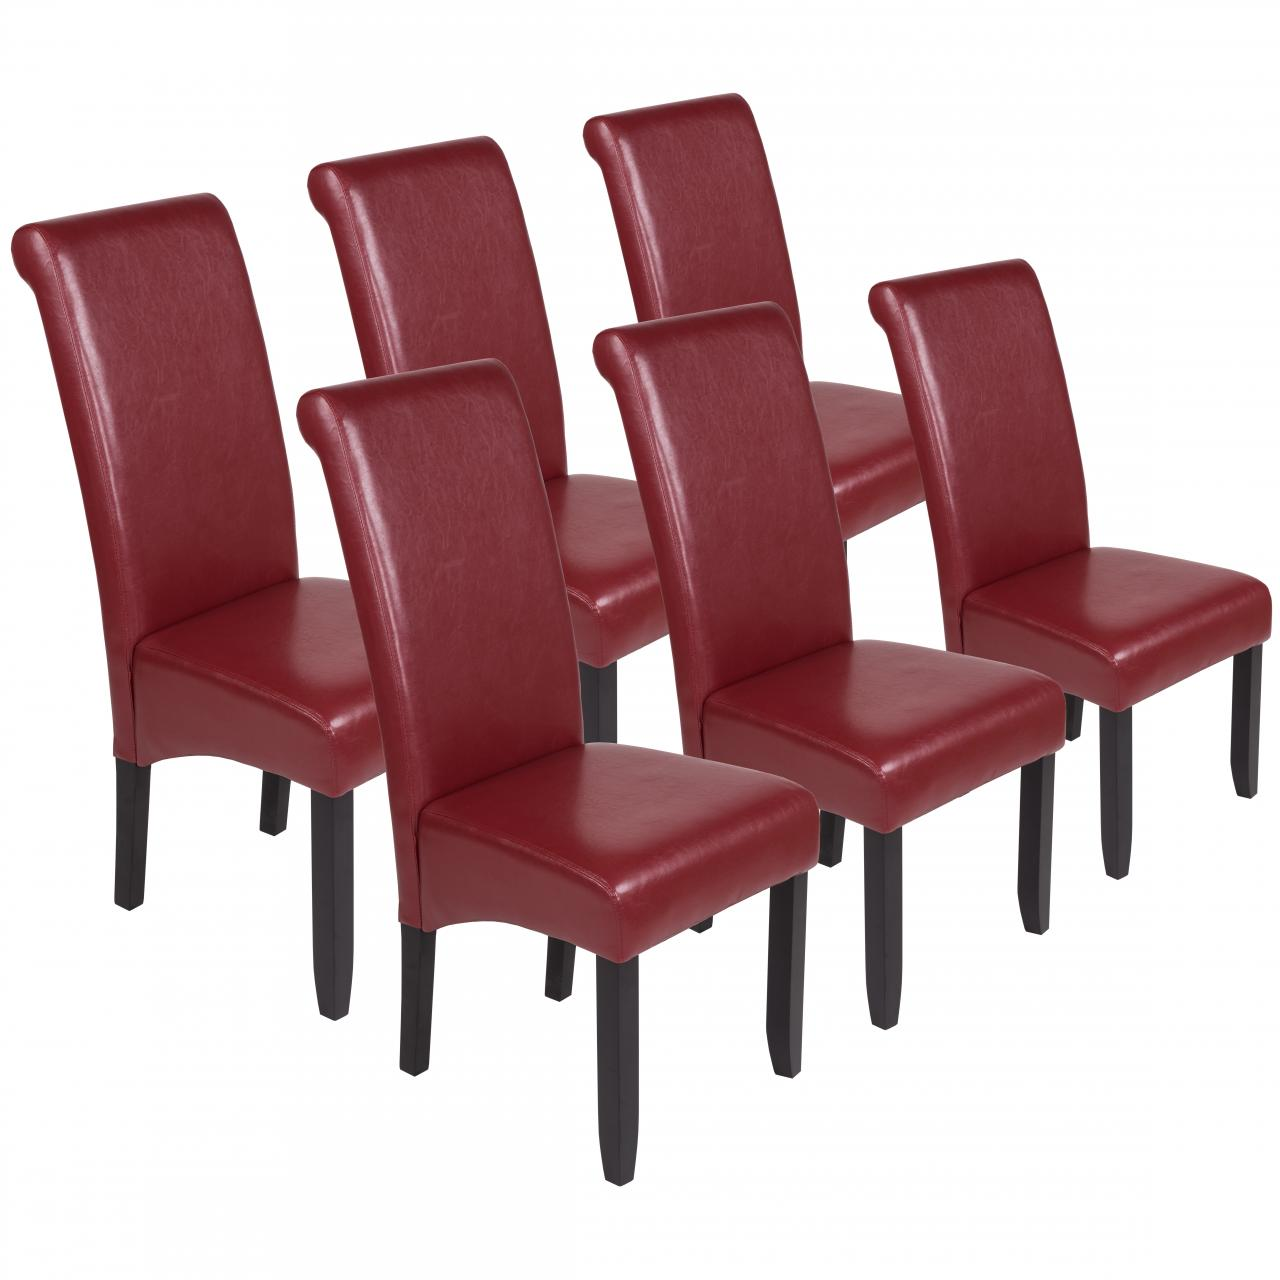 Esszimmerstuehle-Stuehle-Kuechenstuehle-Polsterstuehle-Stuhlgruppe-Gastro-Stuhl-Set